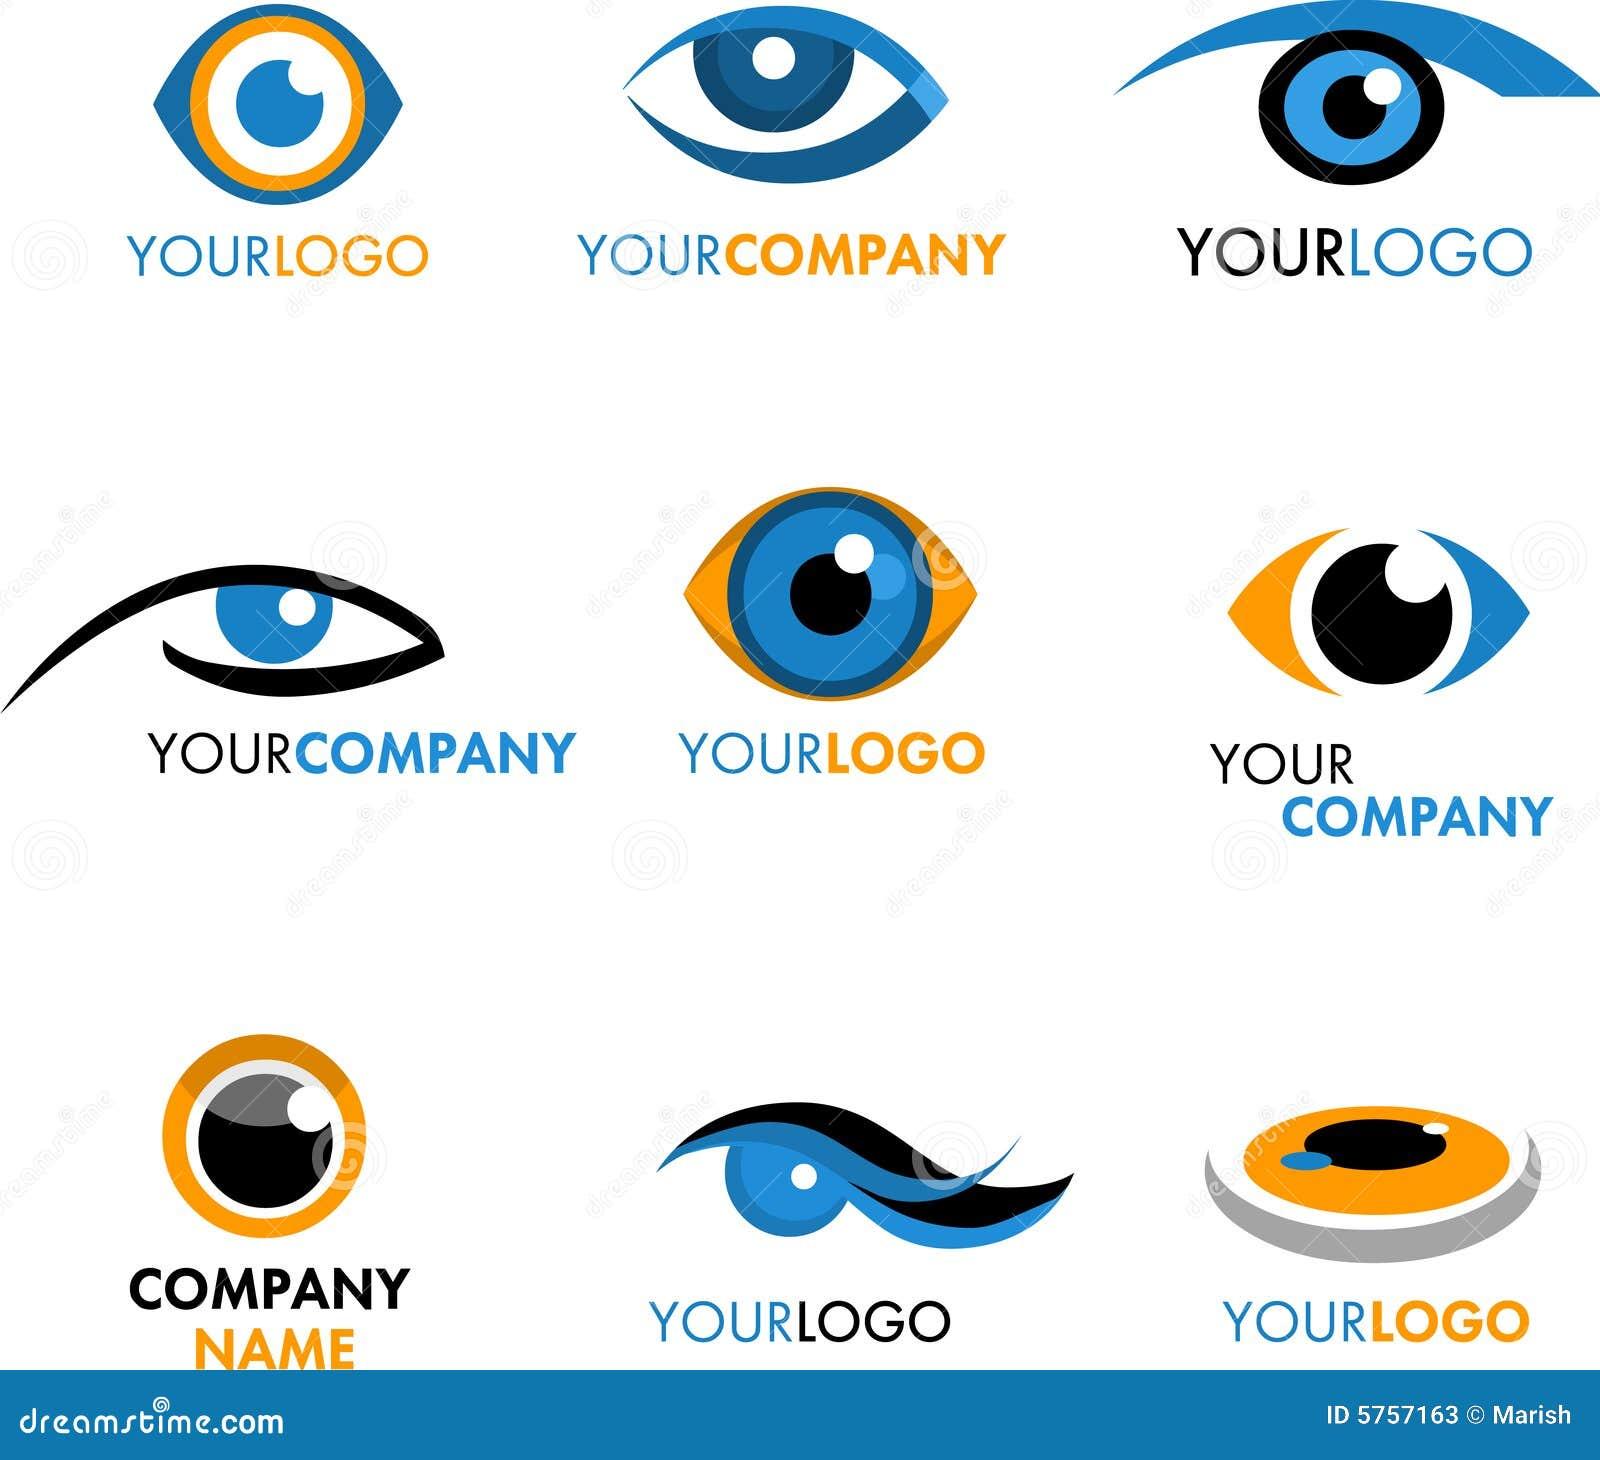 Eyes - logos and icons